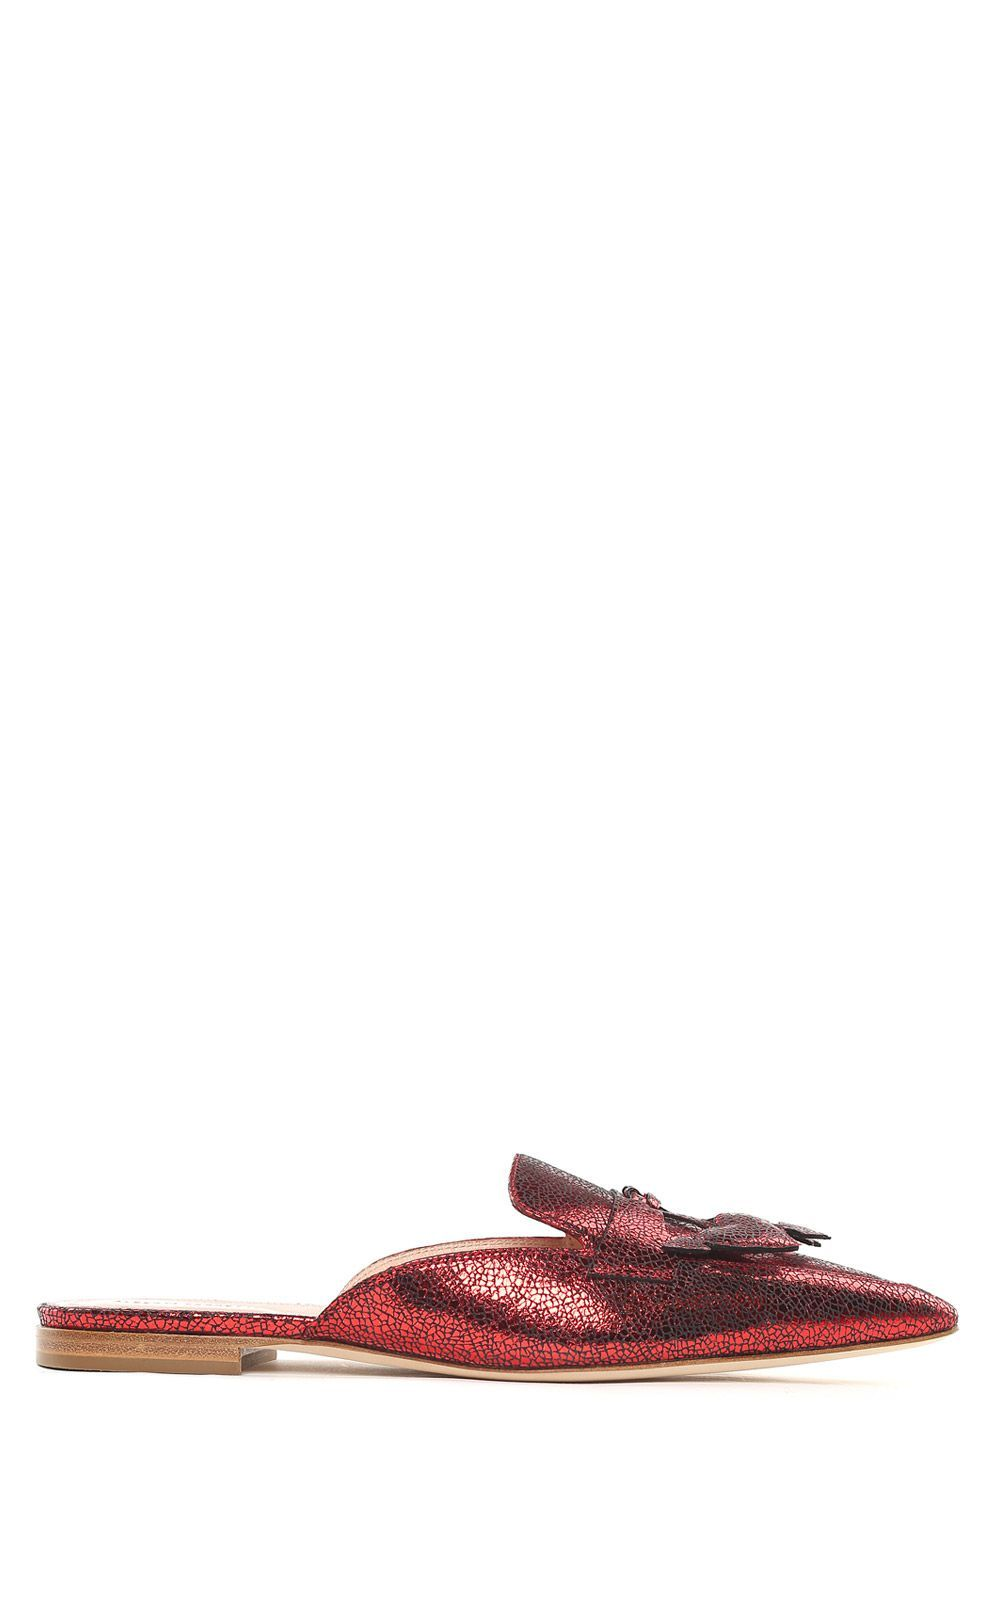 Mia metallic-leather backless loafers Alberta Ferretti S97QFBvZs